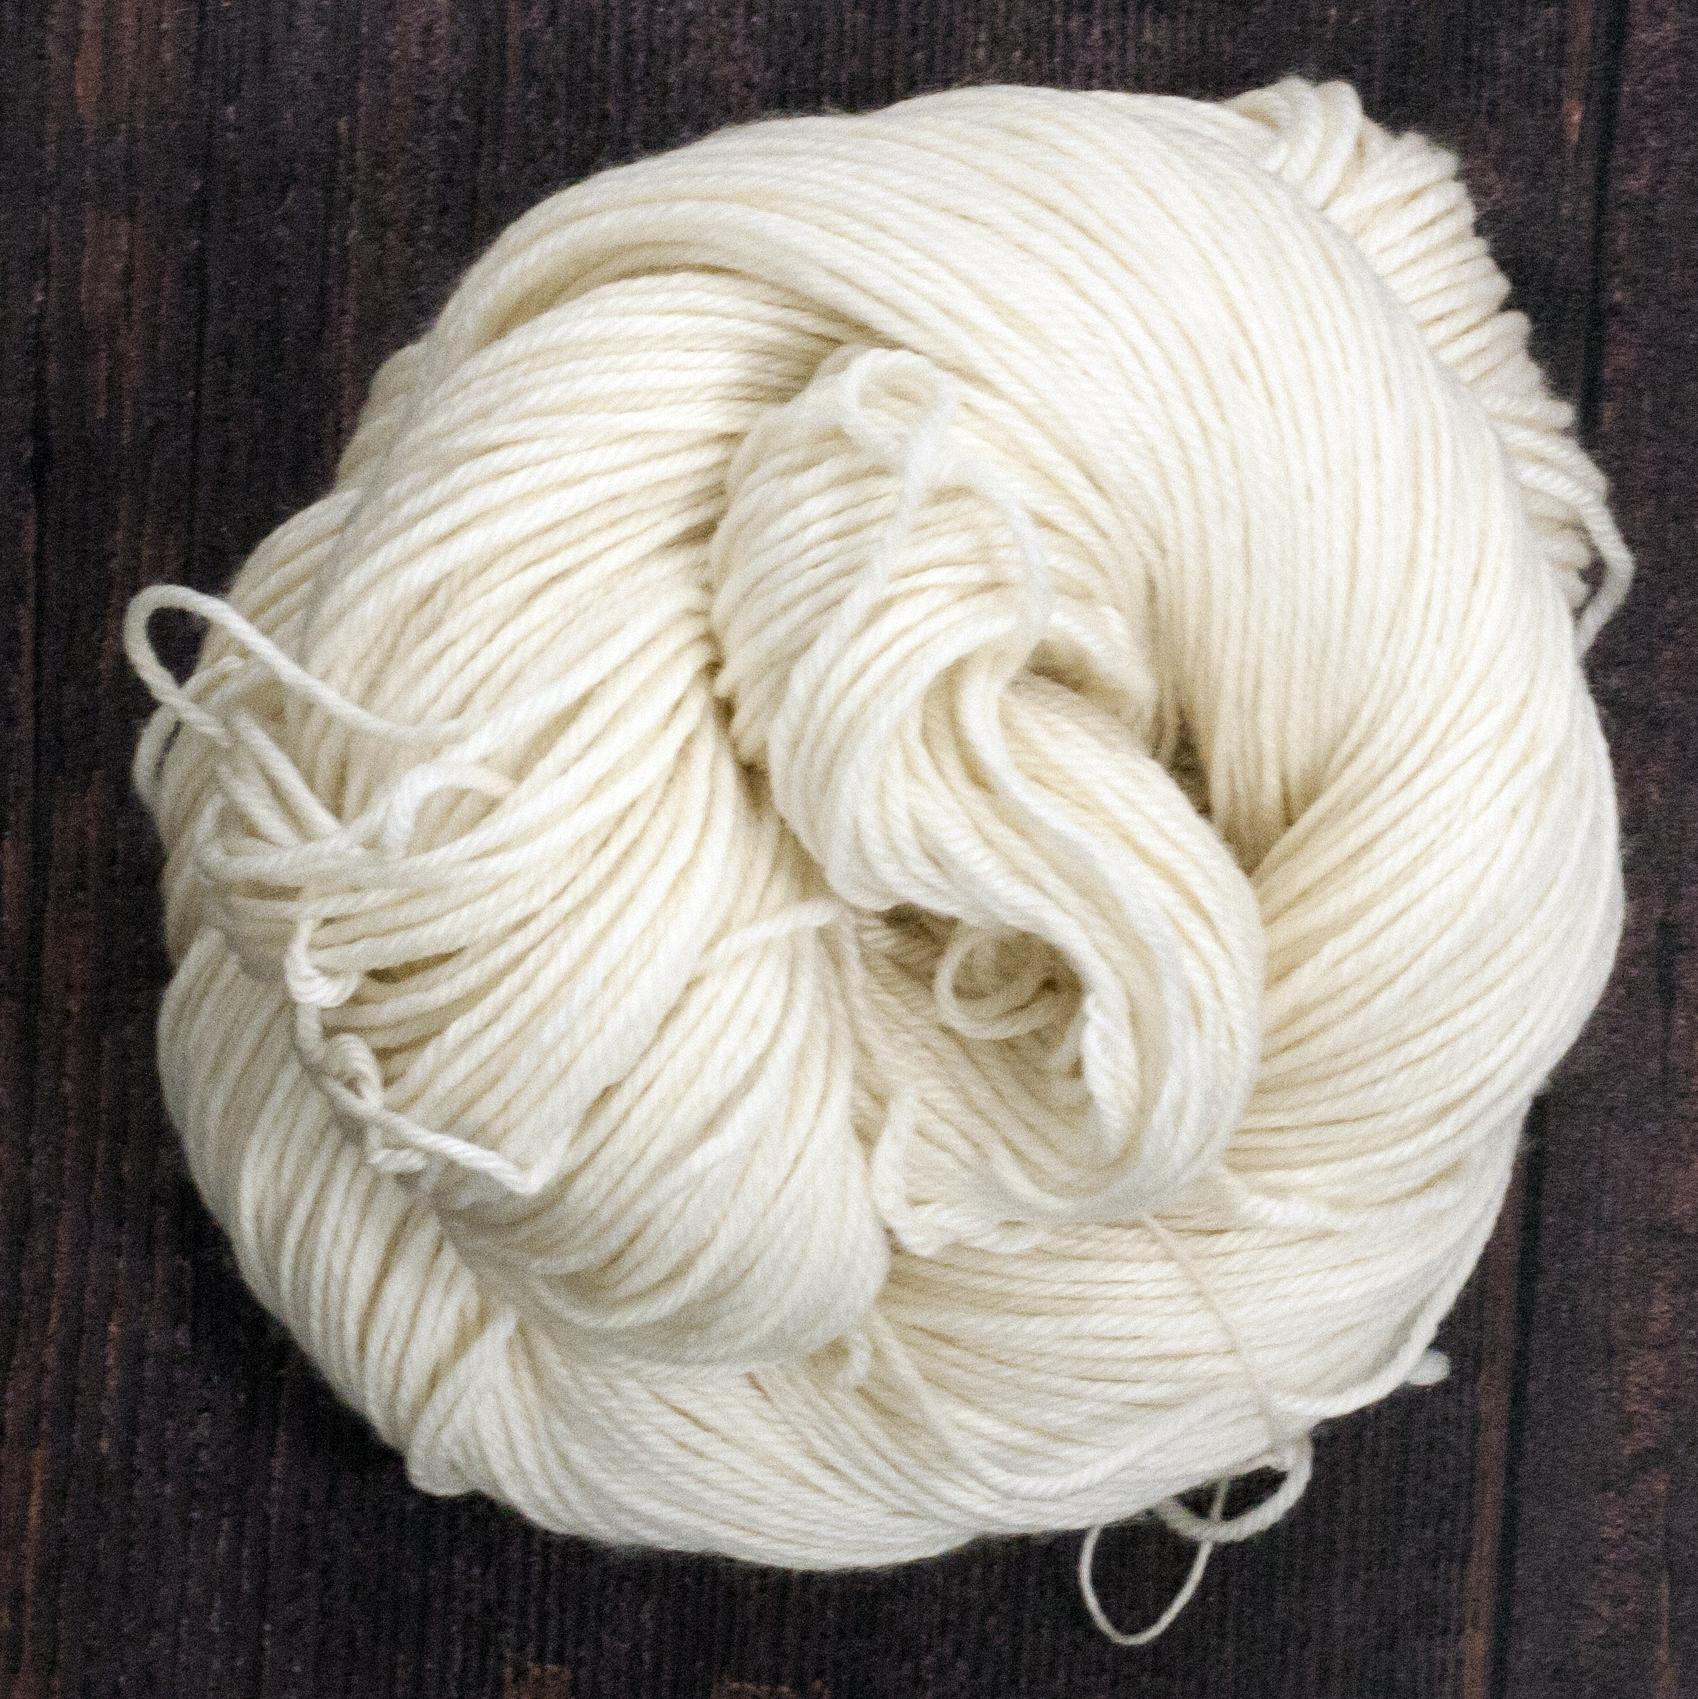 Type 49204B  DK 115 (Worsted)  100% Superwash Extrafine Merino Wool Springy Twist  115g Hanks 230m per 115g (200m per 100g) 4/8nm